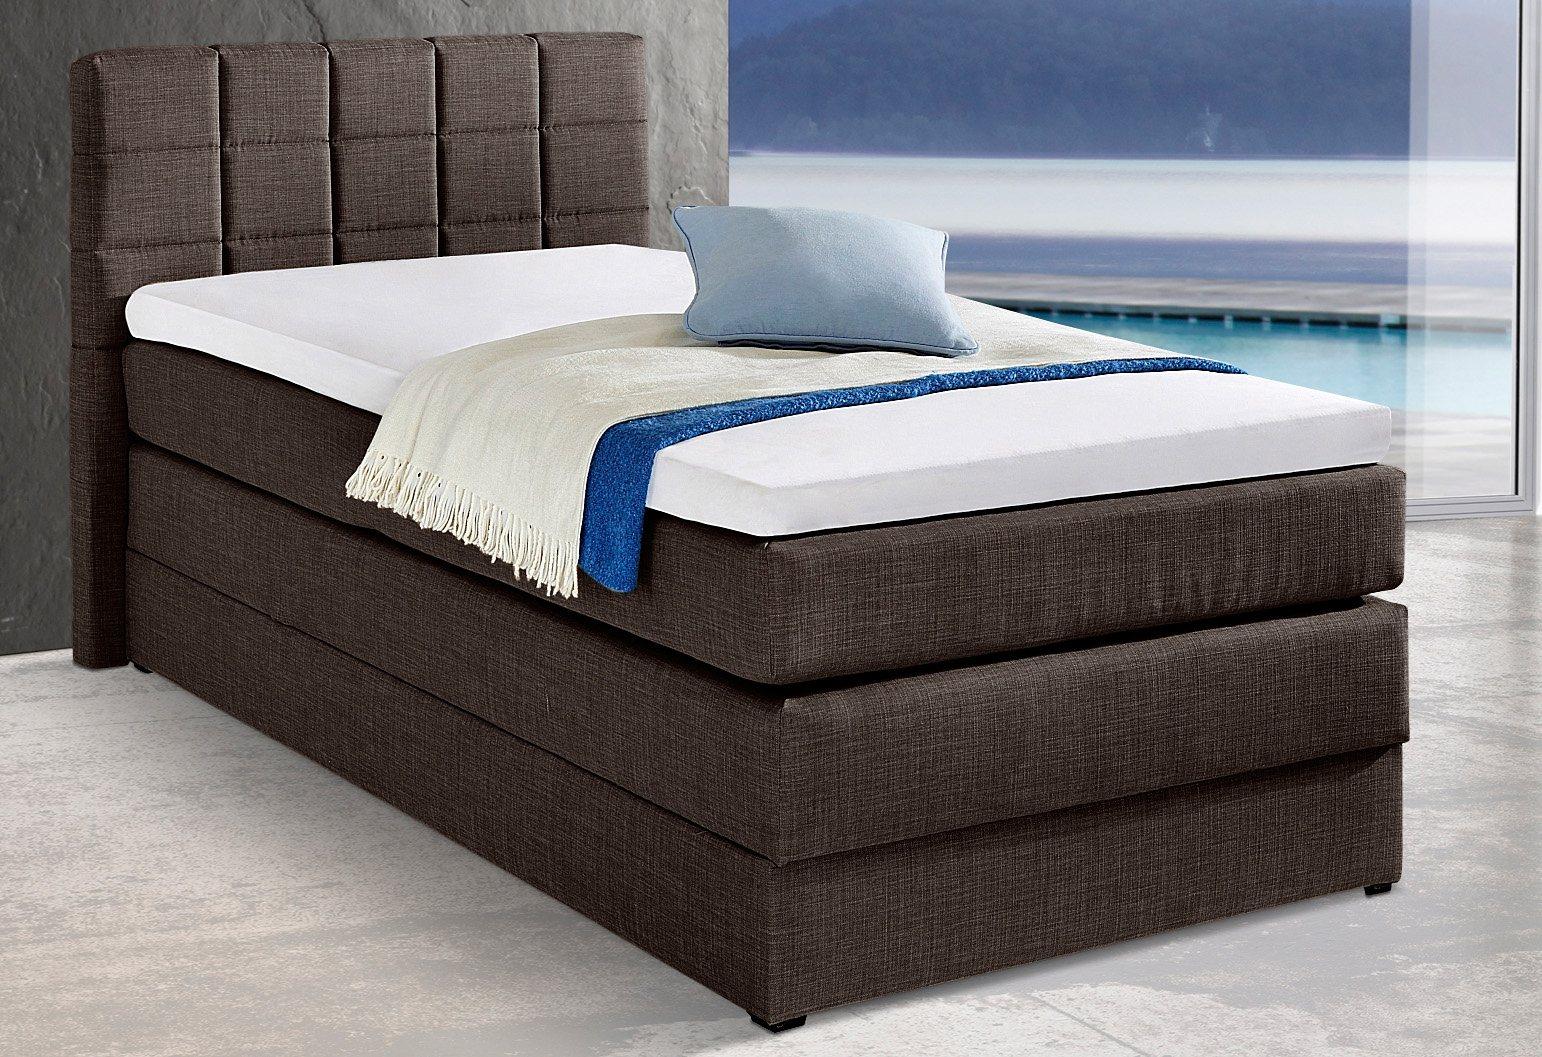 sand boxspringbetten online kaufen m bel suchmaschine. Black Bedroom Furniture Sets. Home Design Ideas